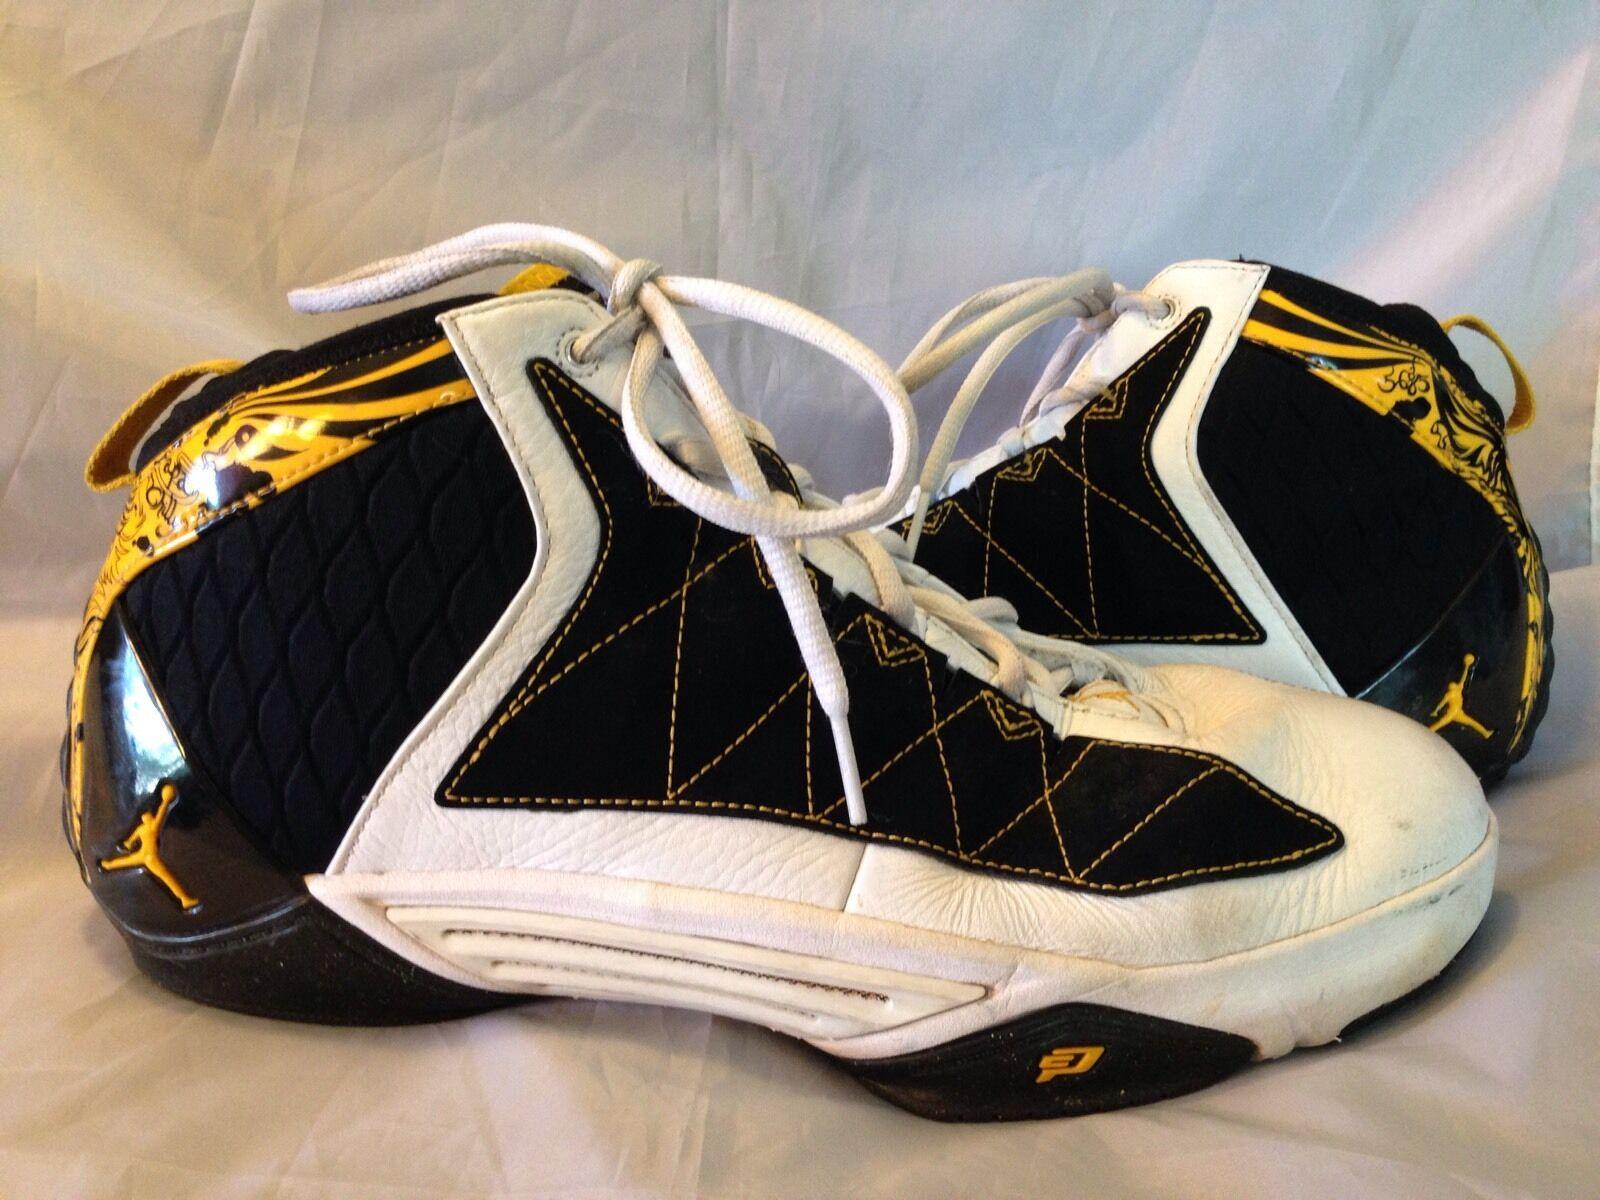 Nike Air Jordan CP3.II Sunstone Chris Paul 2 Bred Doernbecher Sneakers Shoe 10.5